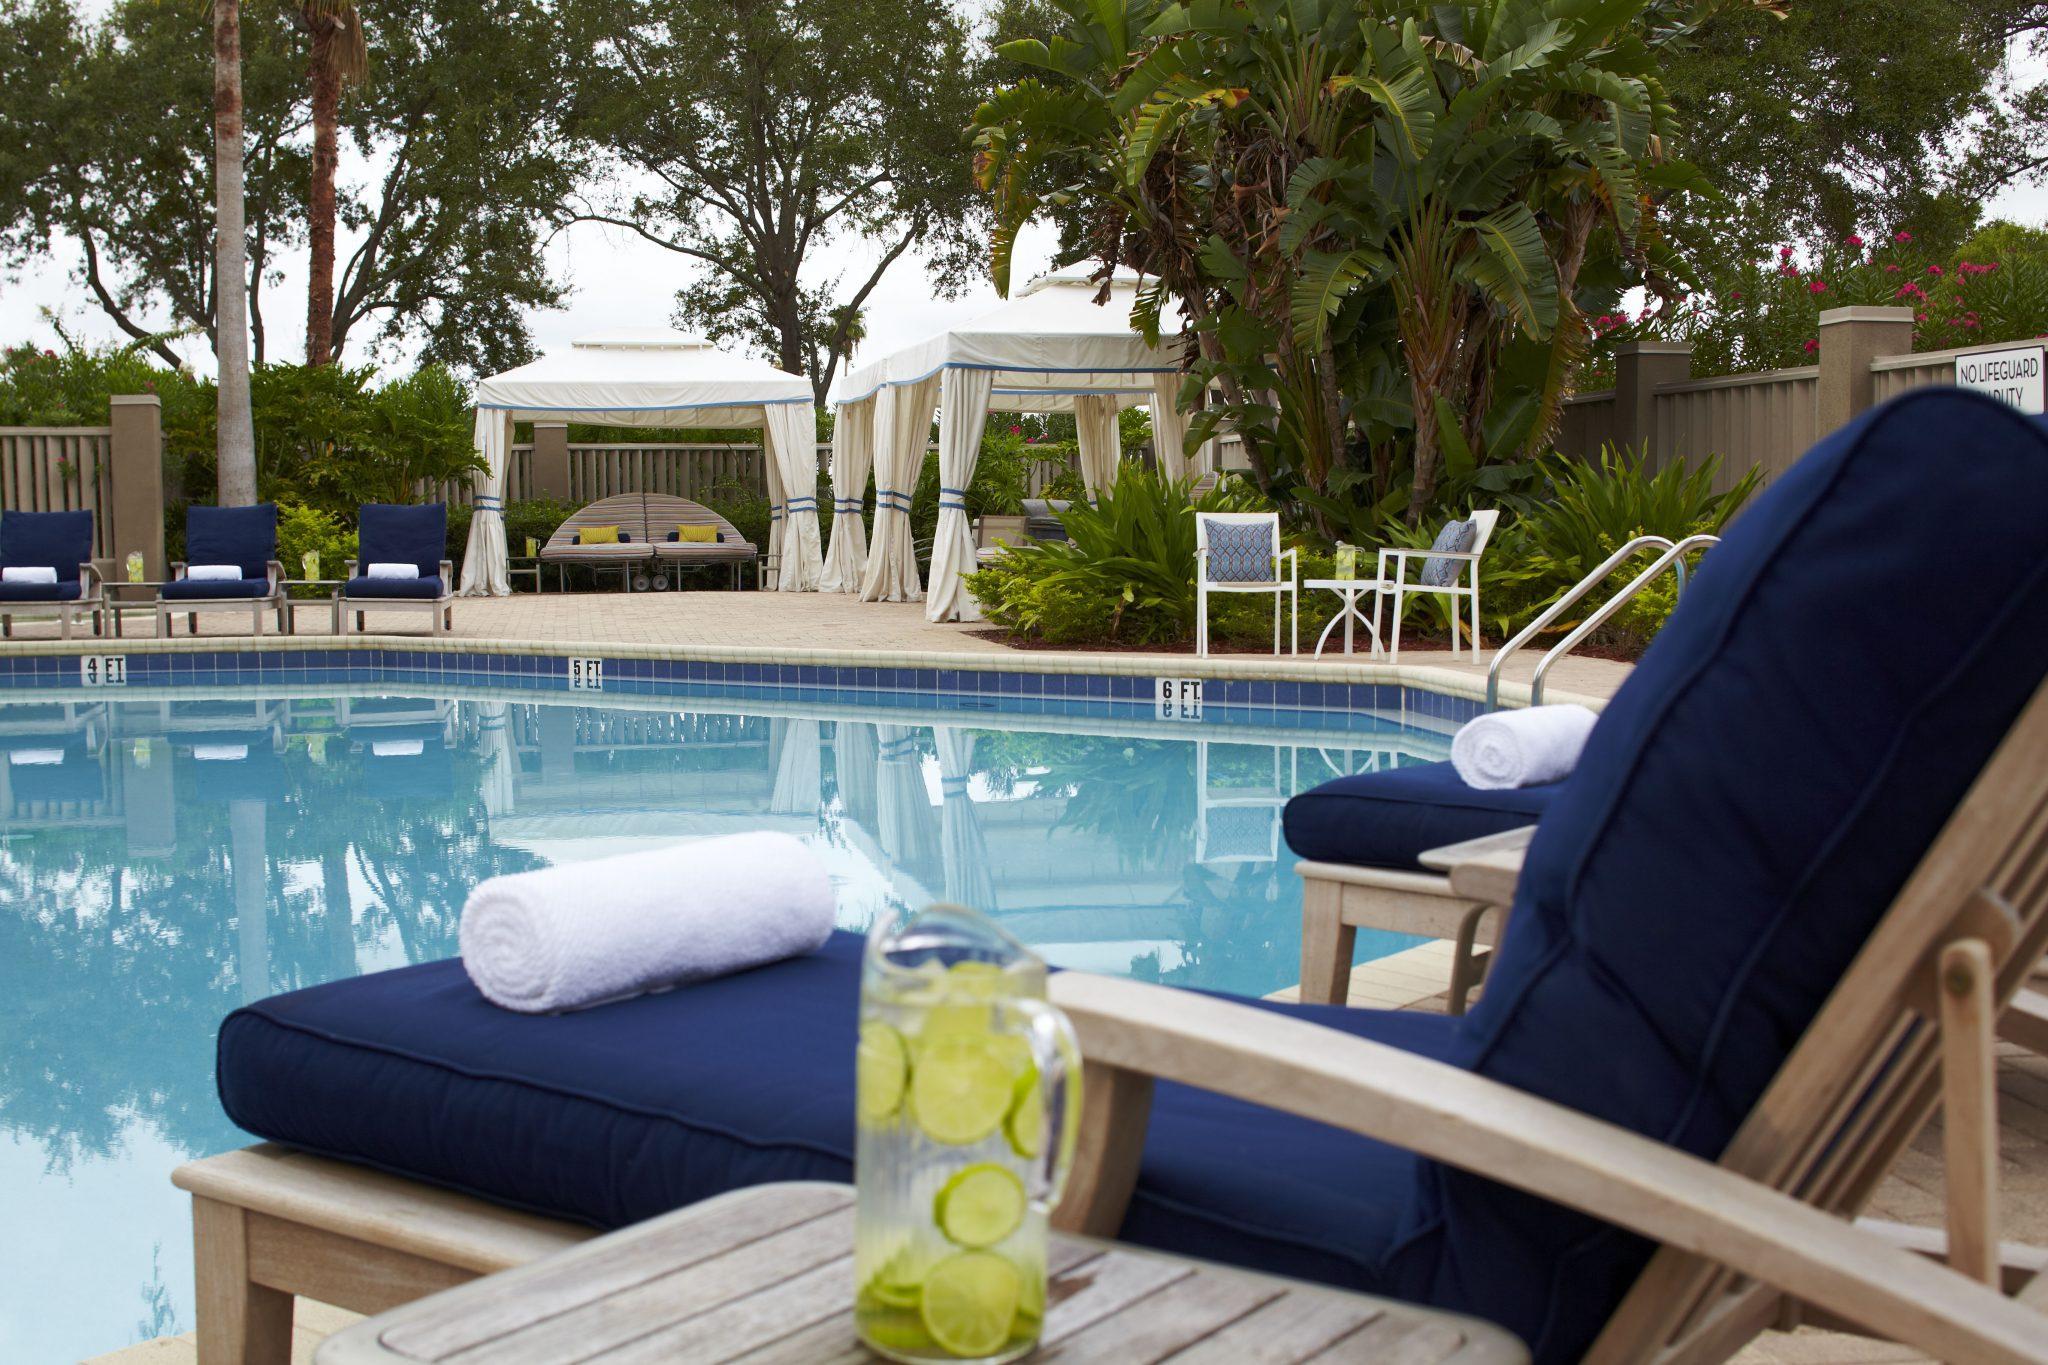 renaissance orlando airport hotel. Black Bedroom Furniture Sets. Home Design Ideas